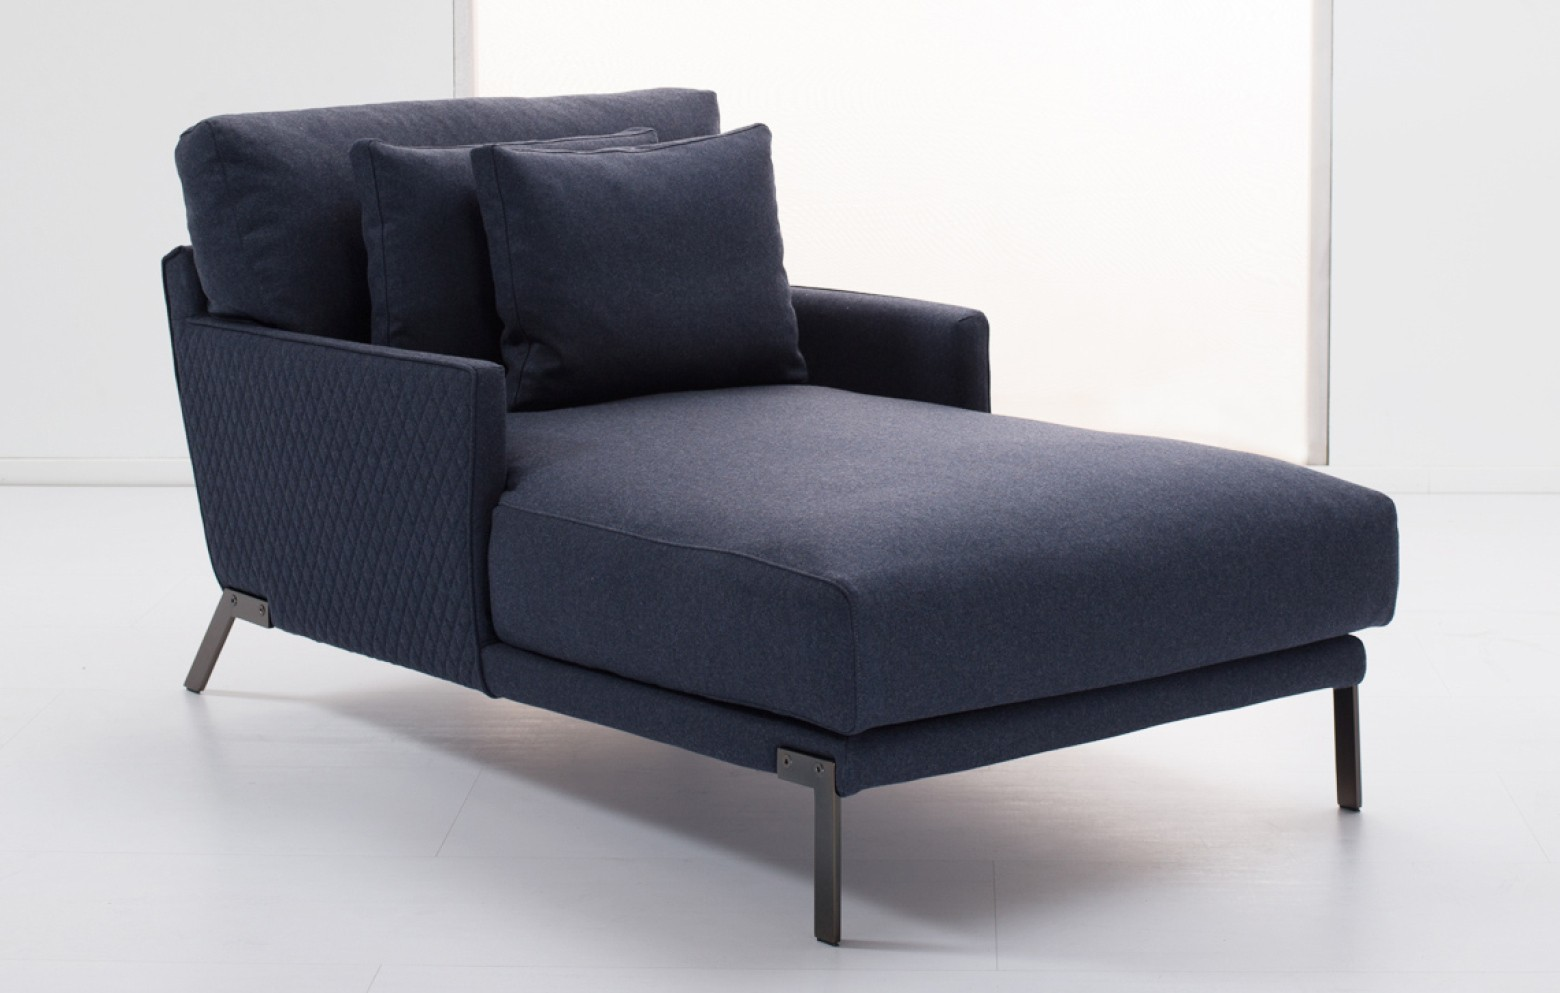 hugo sofas online outlet who 39 s perfect. Black Bedroom Furniture Sets. Home Design Ideas